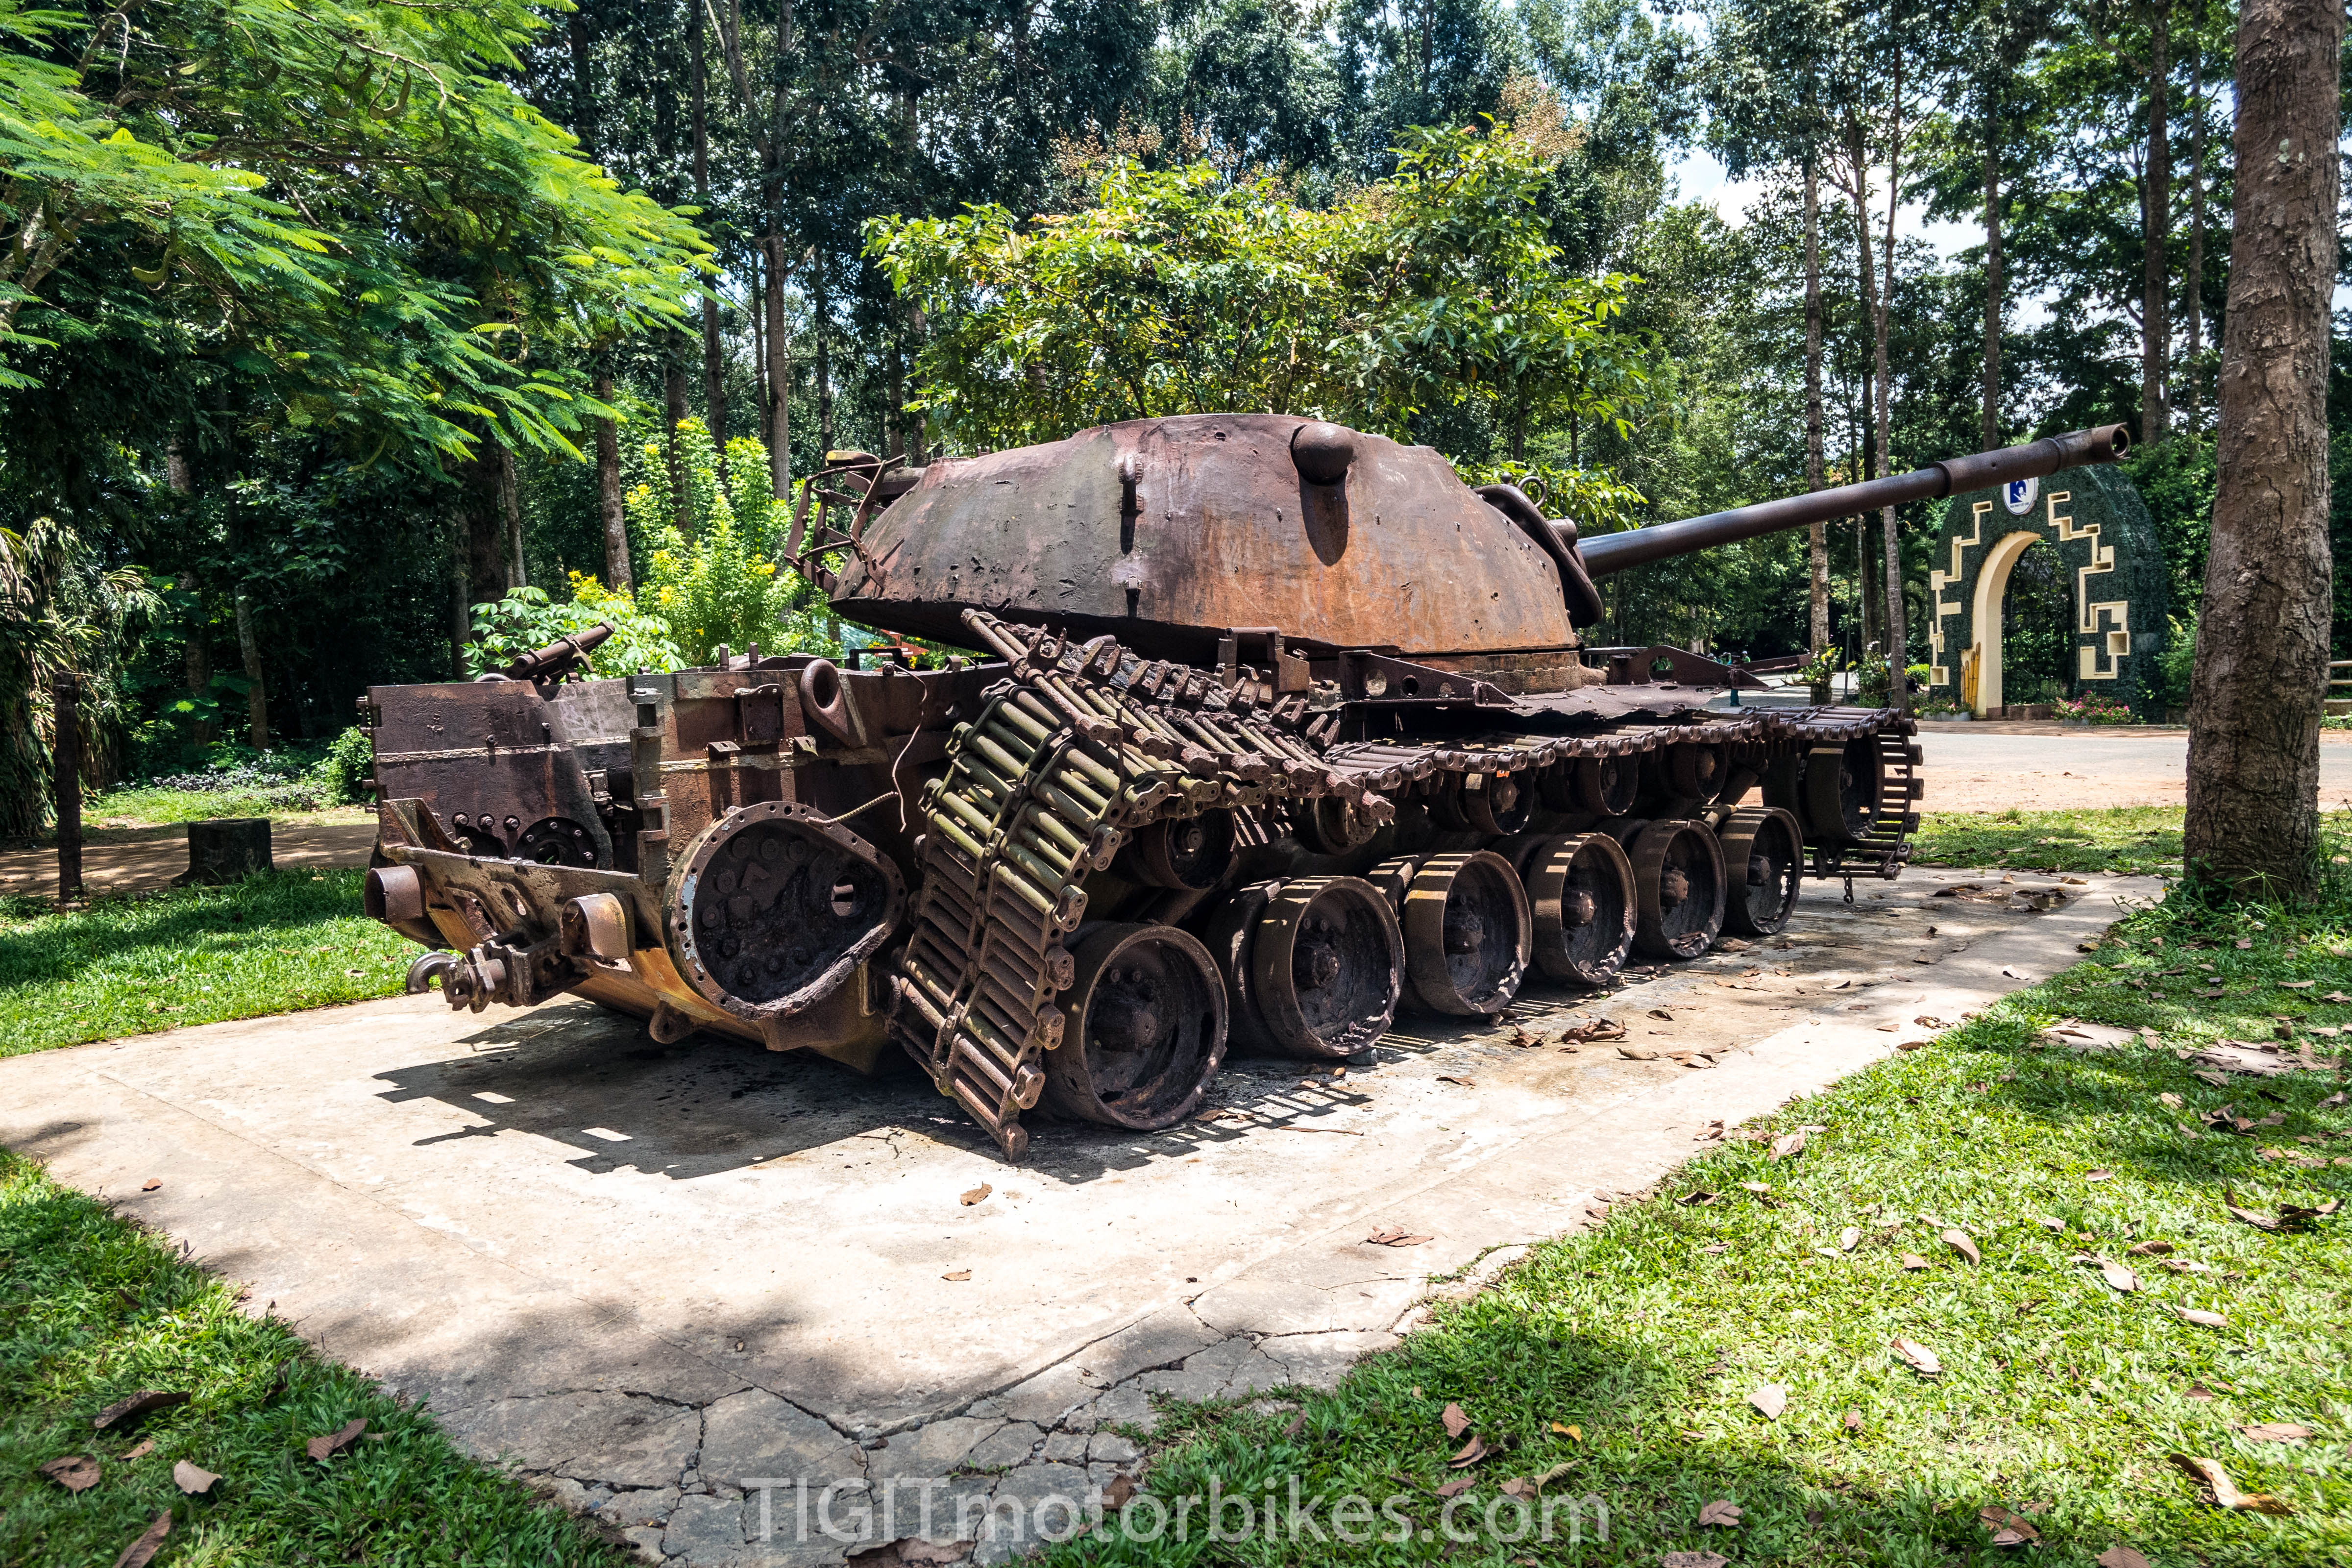 Cu Chi Tunnel Tank